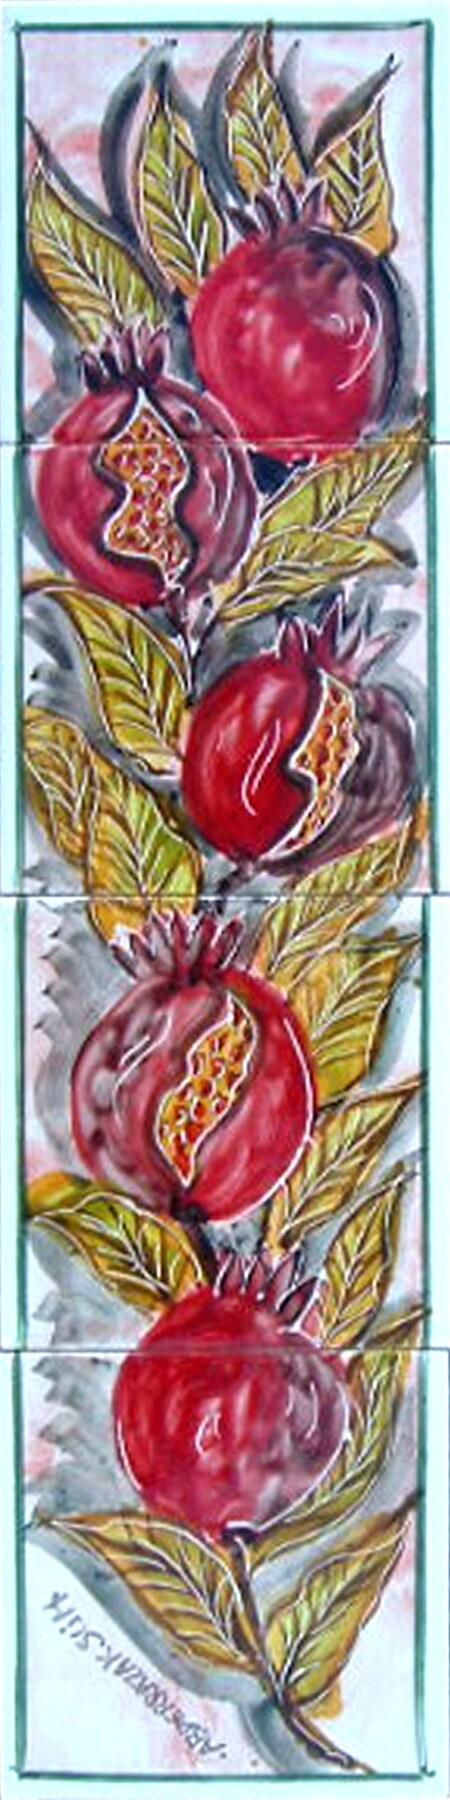 Mosaic 'Pomegranates' 4-tile Ceramic Wall Mural